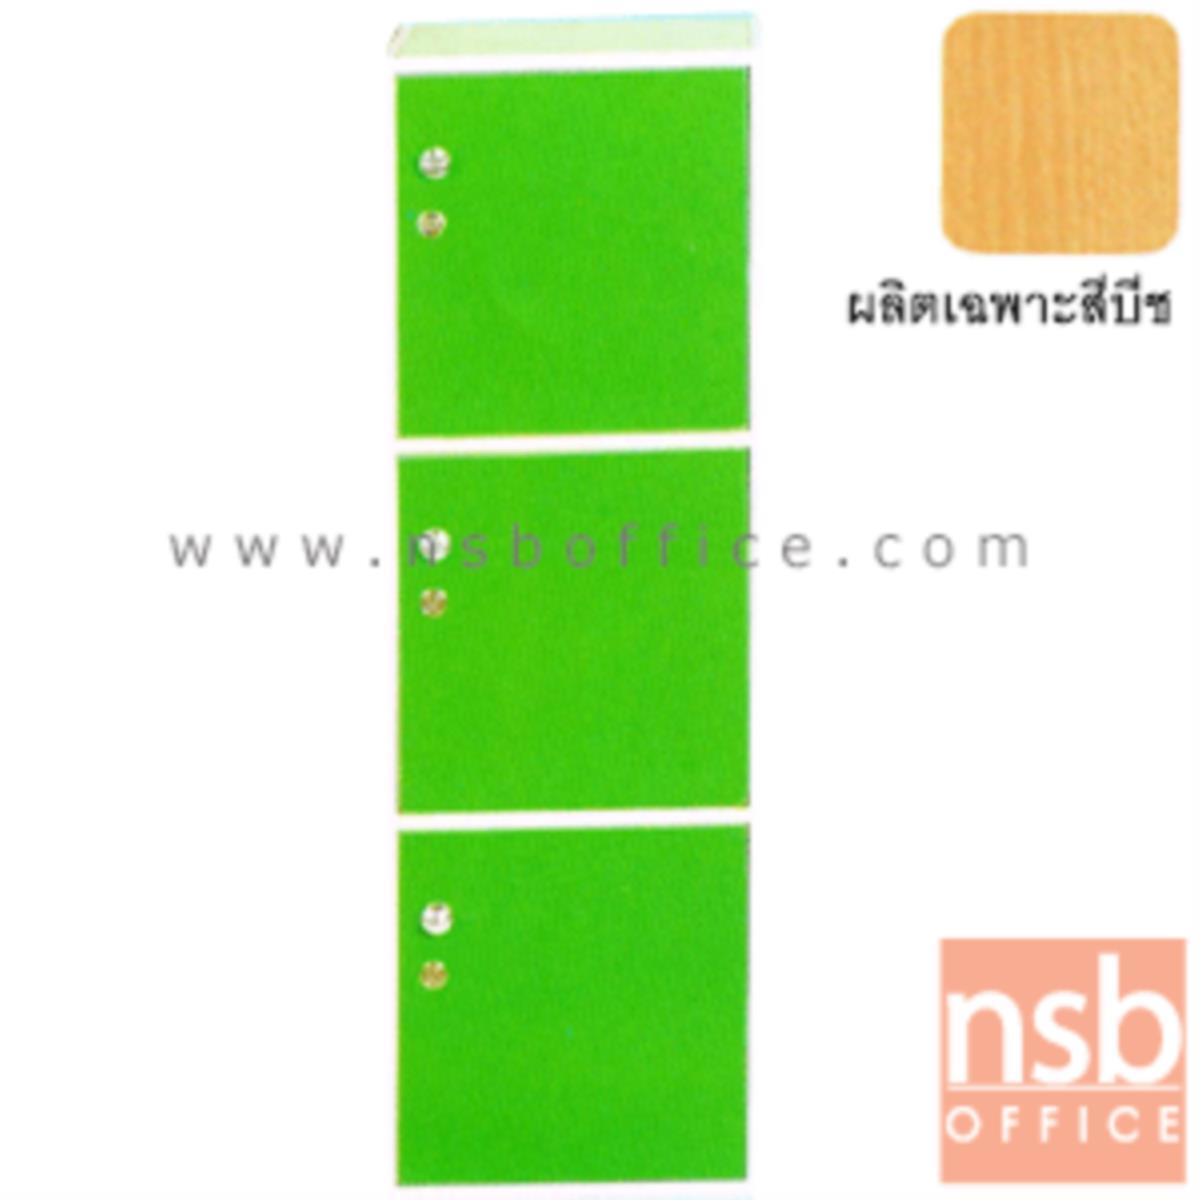 E08A045:ตู้ล็อคเกอร์ไม้คอนโด 3 ชั้น รุ่น NMM-XL381 ขนาด 29.5W*117H cm. กุญแจล็อคแยก สีบีชล้วน